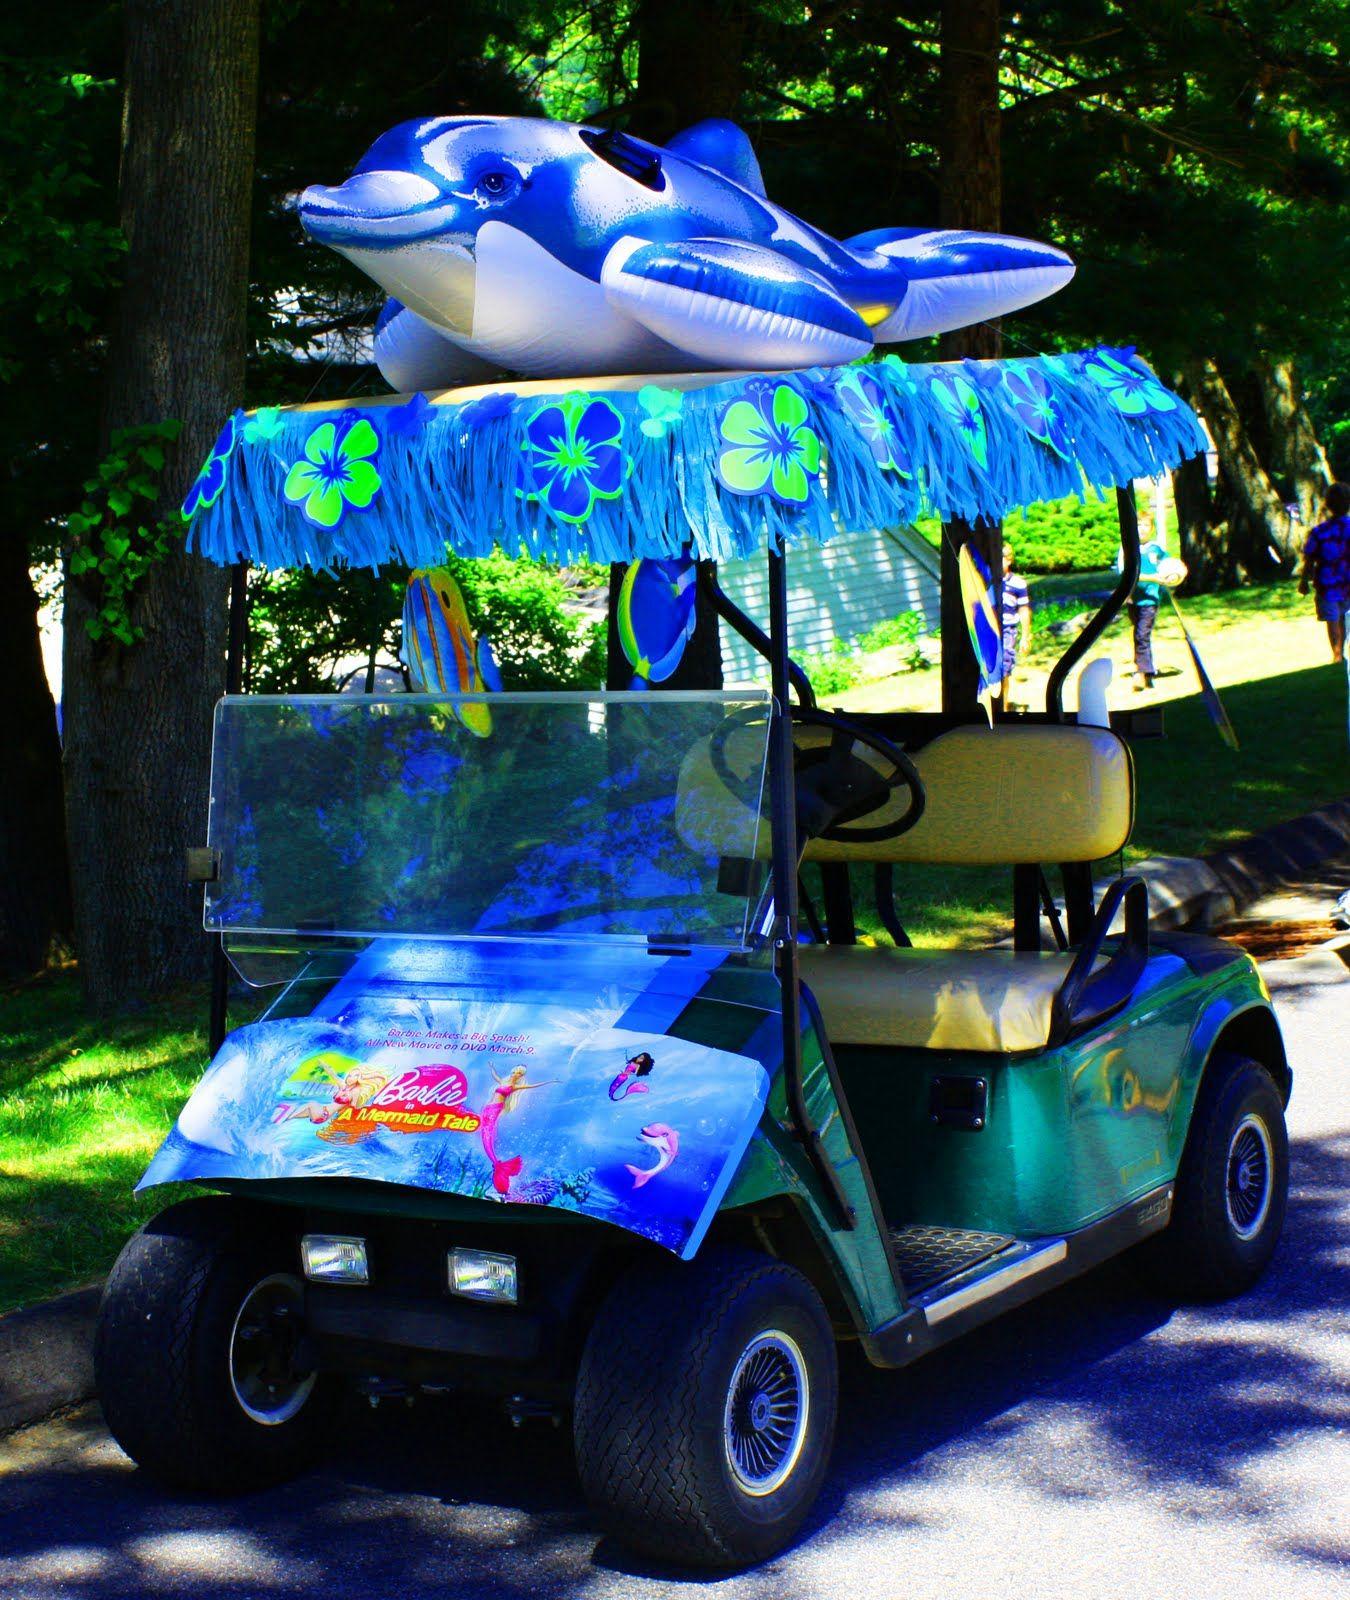 Golf Cart Parade Happy 4th Of July Golf Carts Golf Cart Decorations Golf Theme